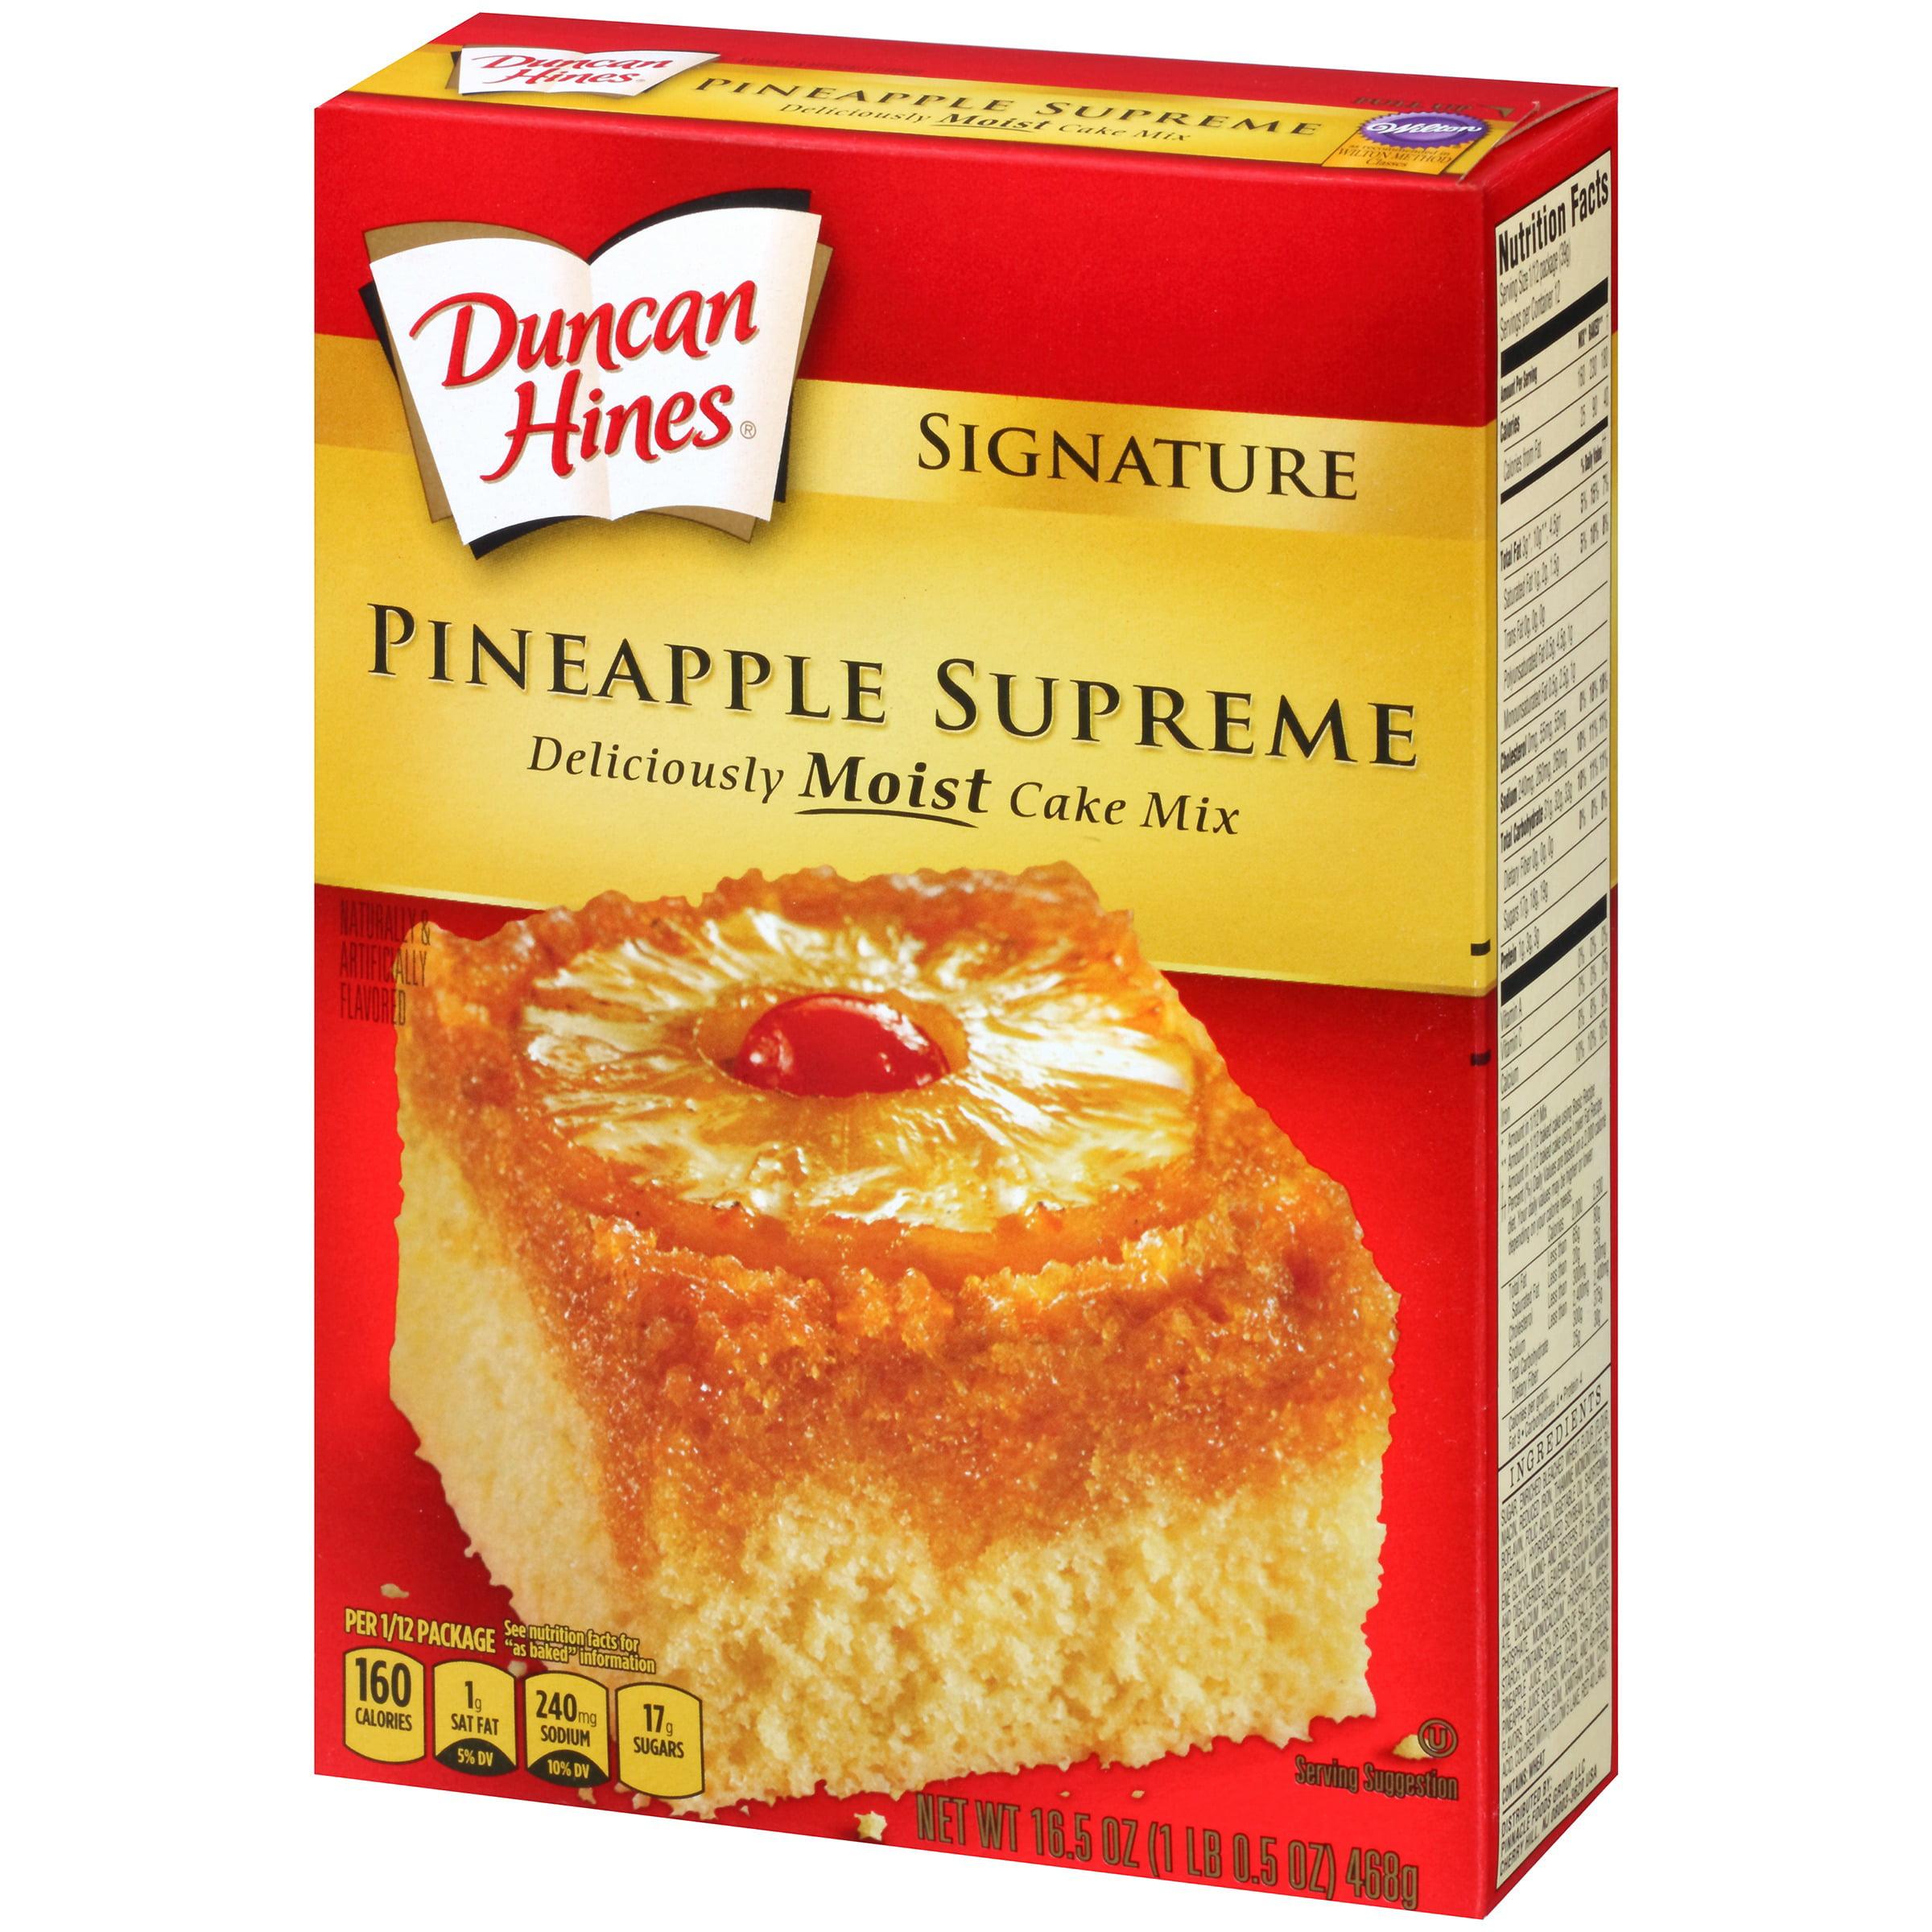 Duncan hines pineapple supreme cake recipe